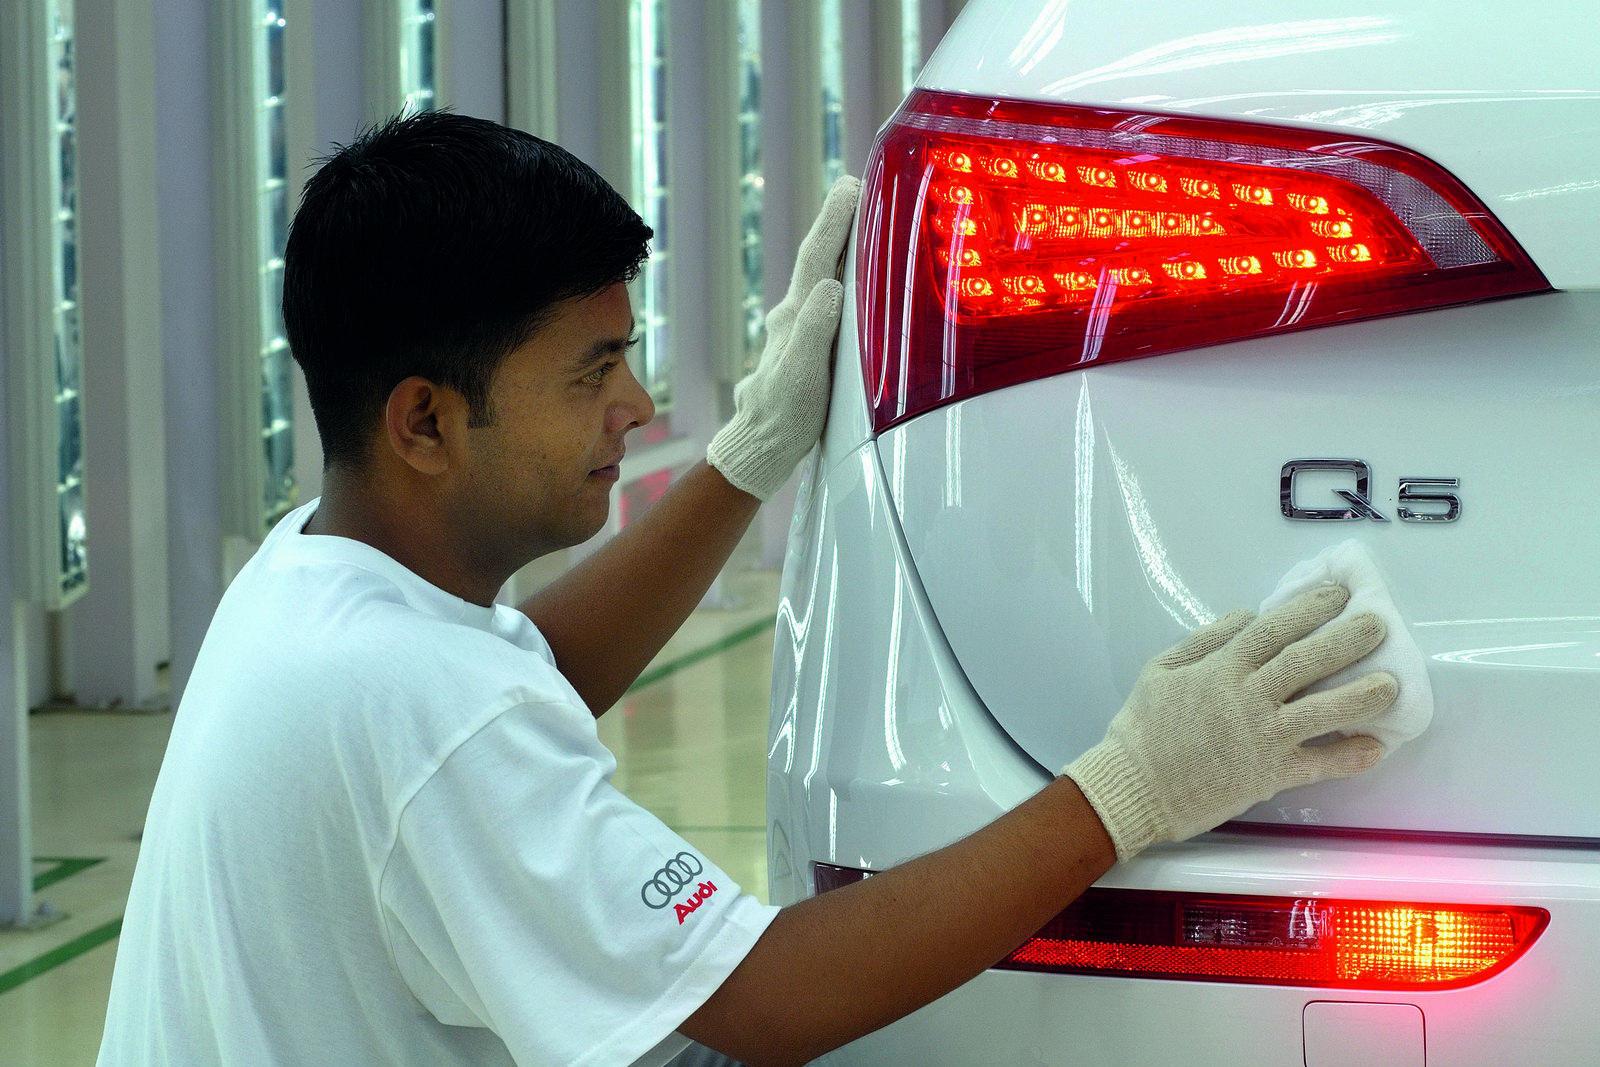 http://2.bp.blogspot.com/_FoXyvaPSnVk/TDS_0lKlH9I/AAAAAAADDAY/YVGOTE2c4ro/s1600/Audi-Q5-Indian-Plant-3.JPG